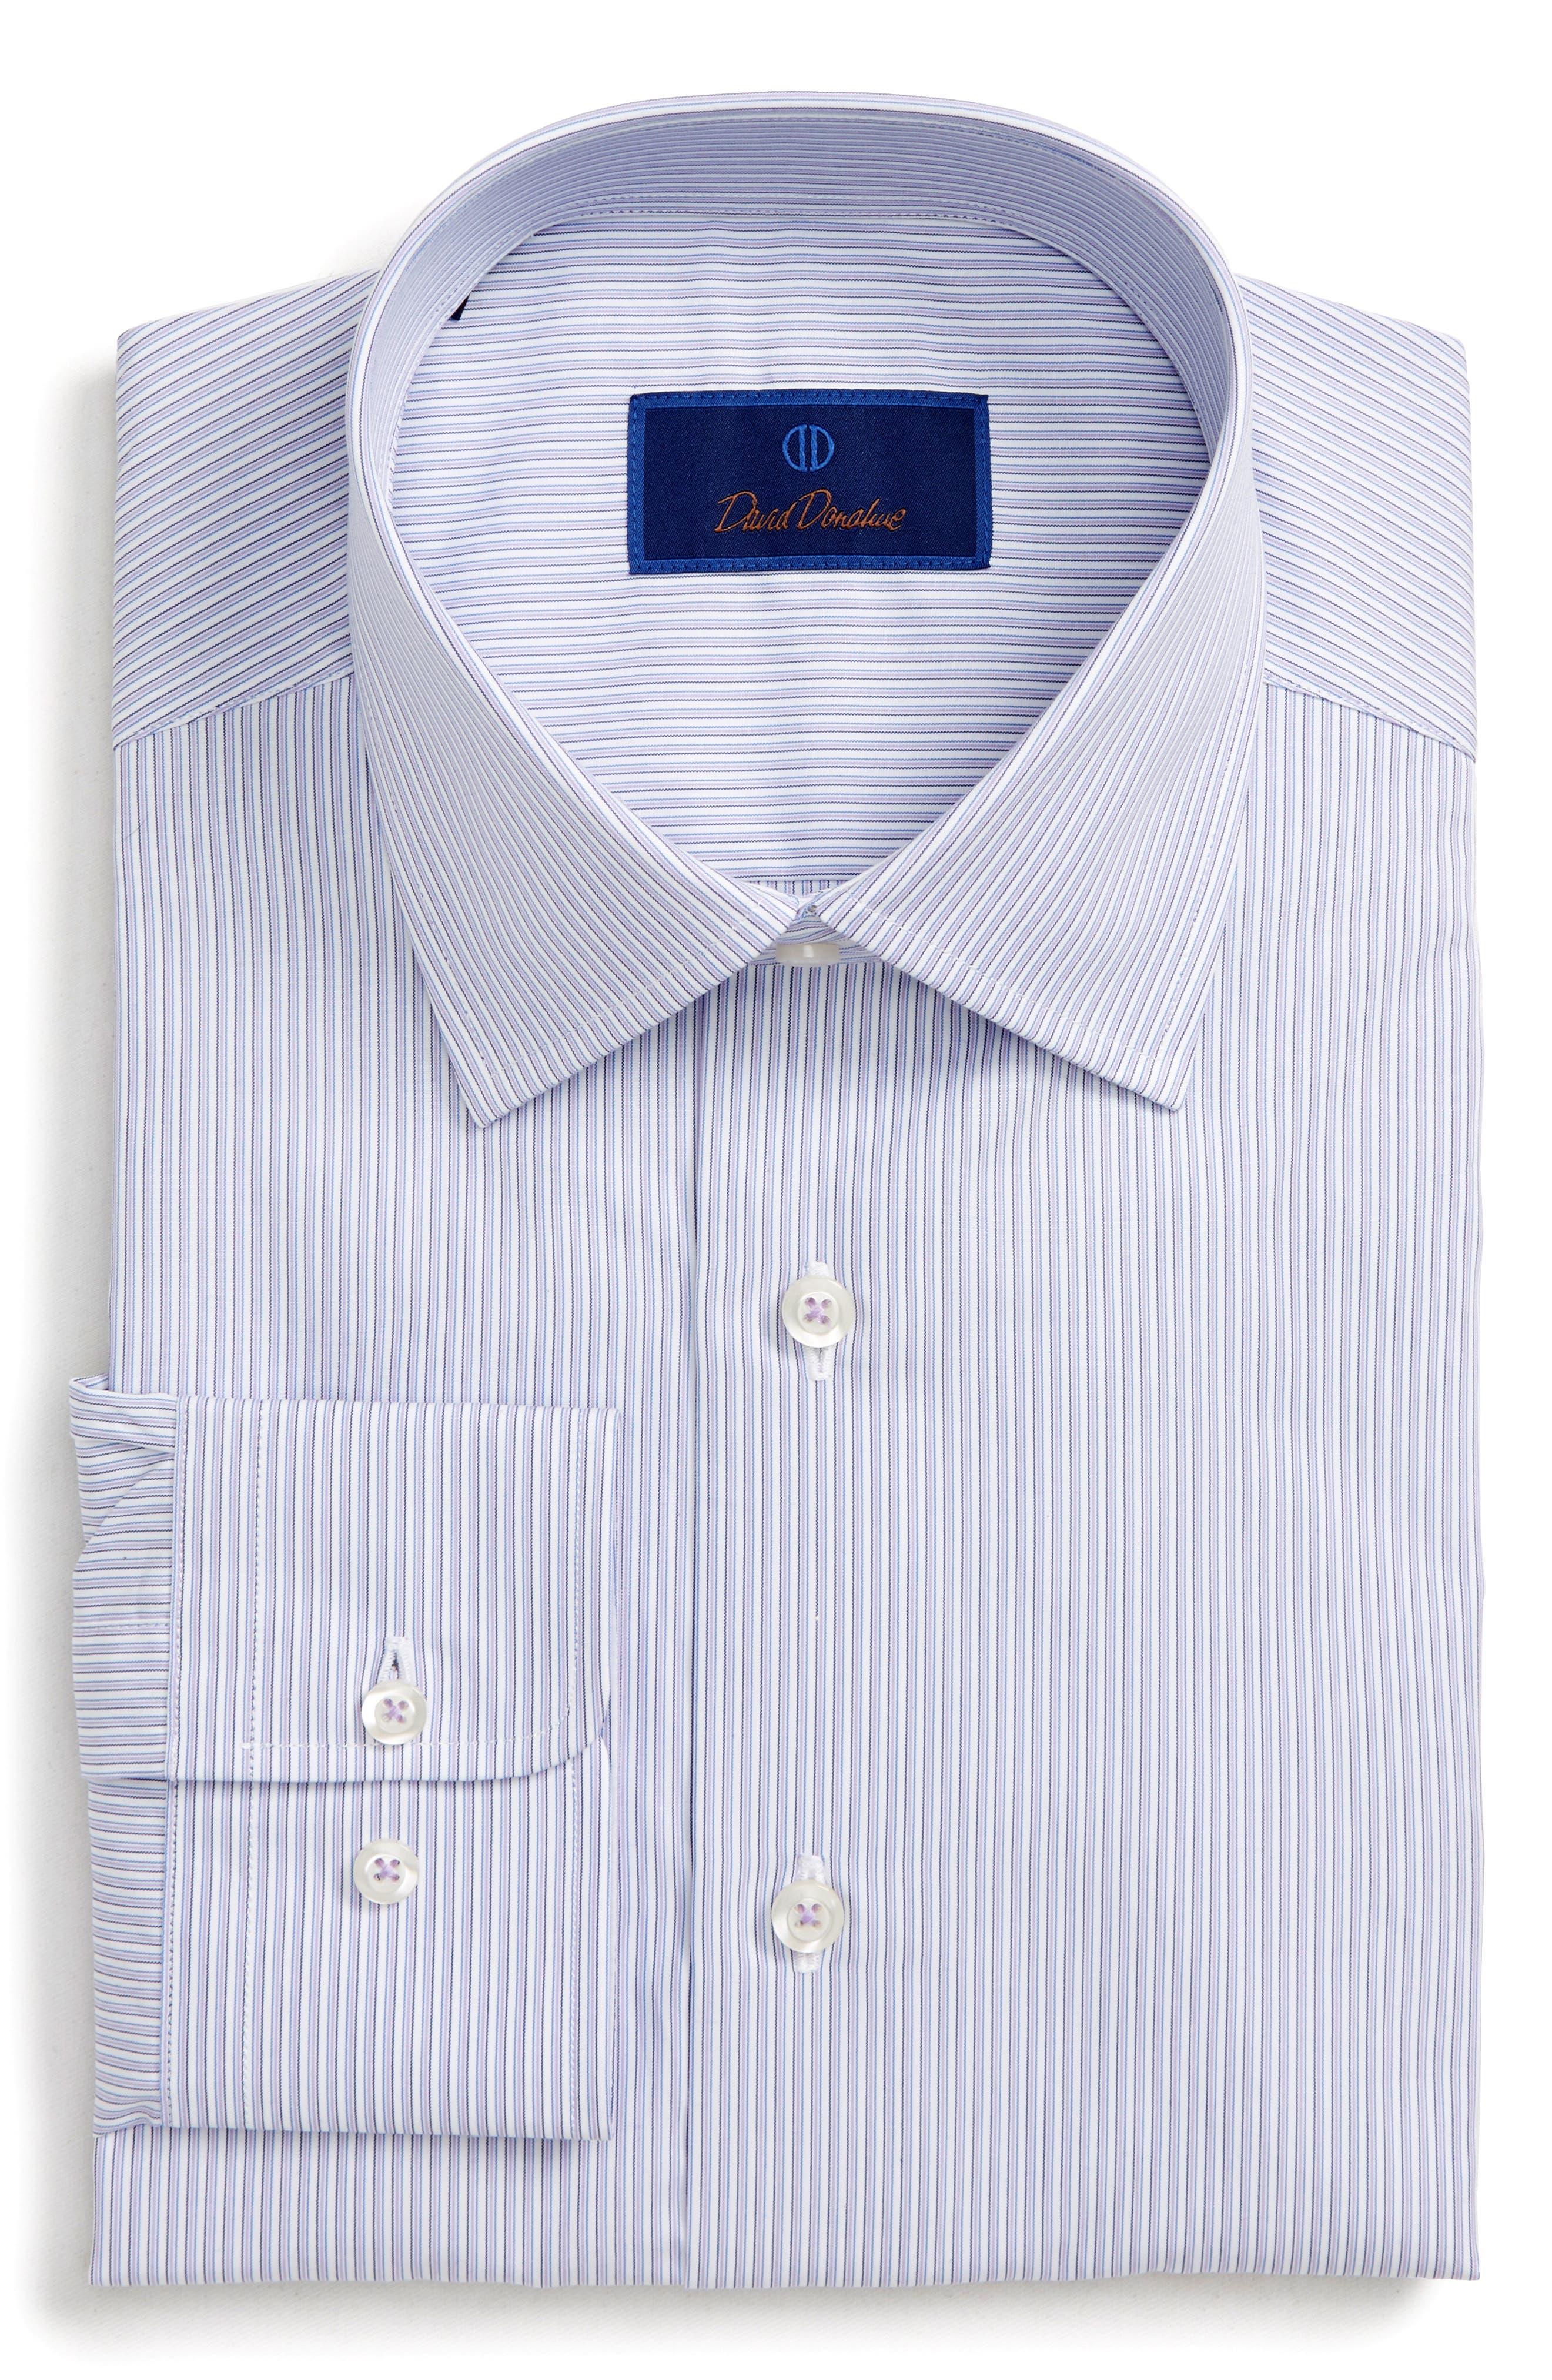 DAVID DONAHUE Men'S Regular-Fit Framed Stripe Dress Shirt in Lilac